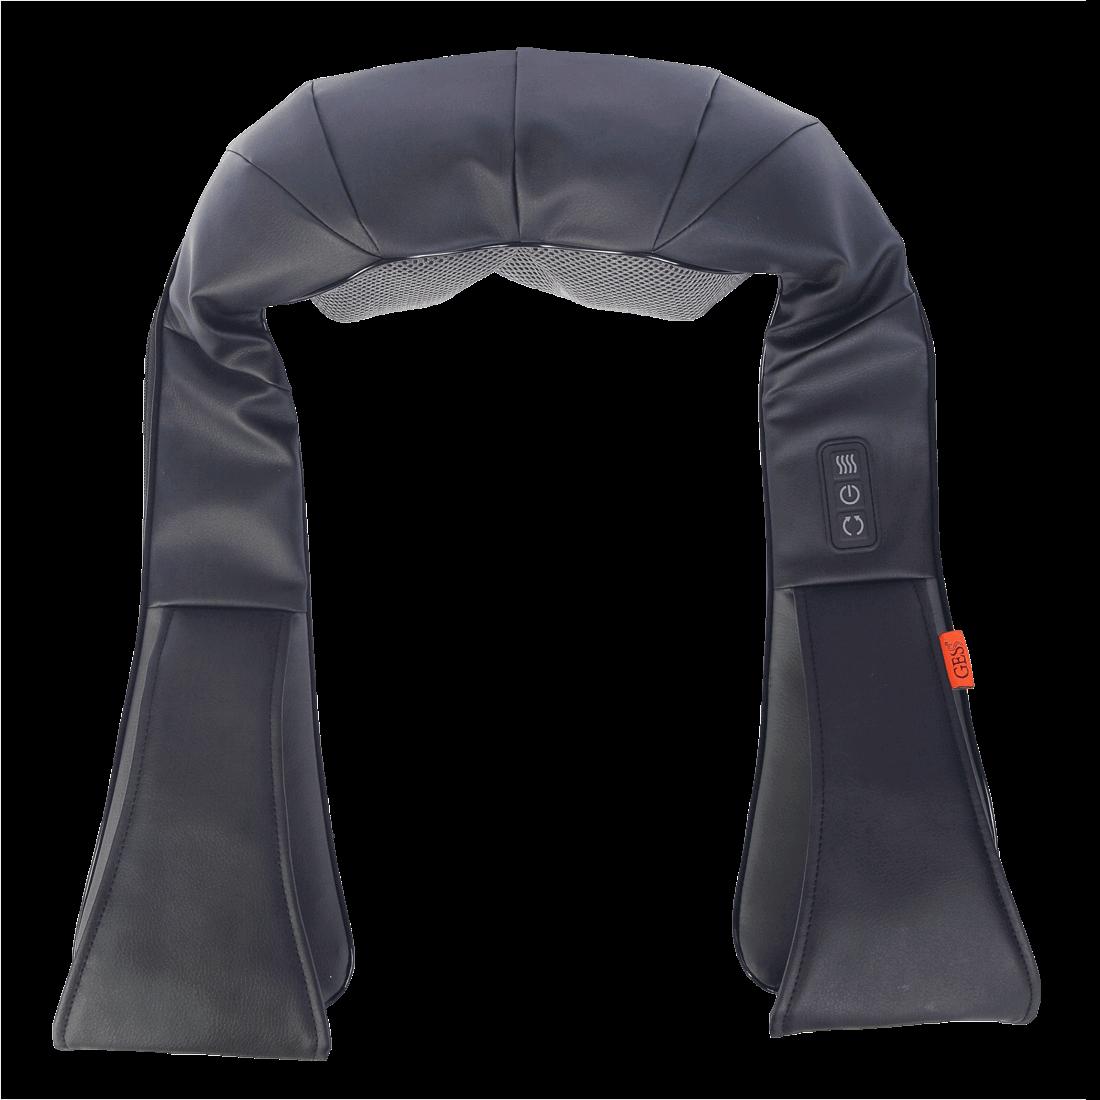 Gess Kragen массажная подушка для шеи и плеч